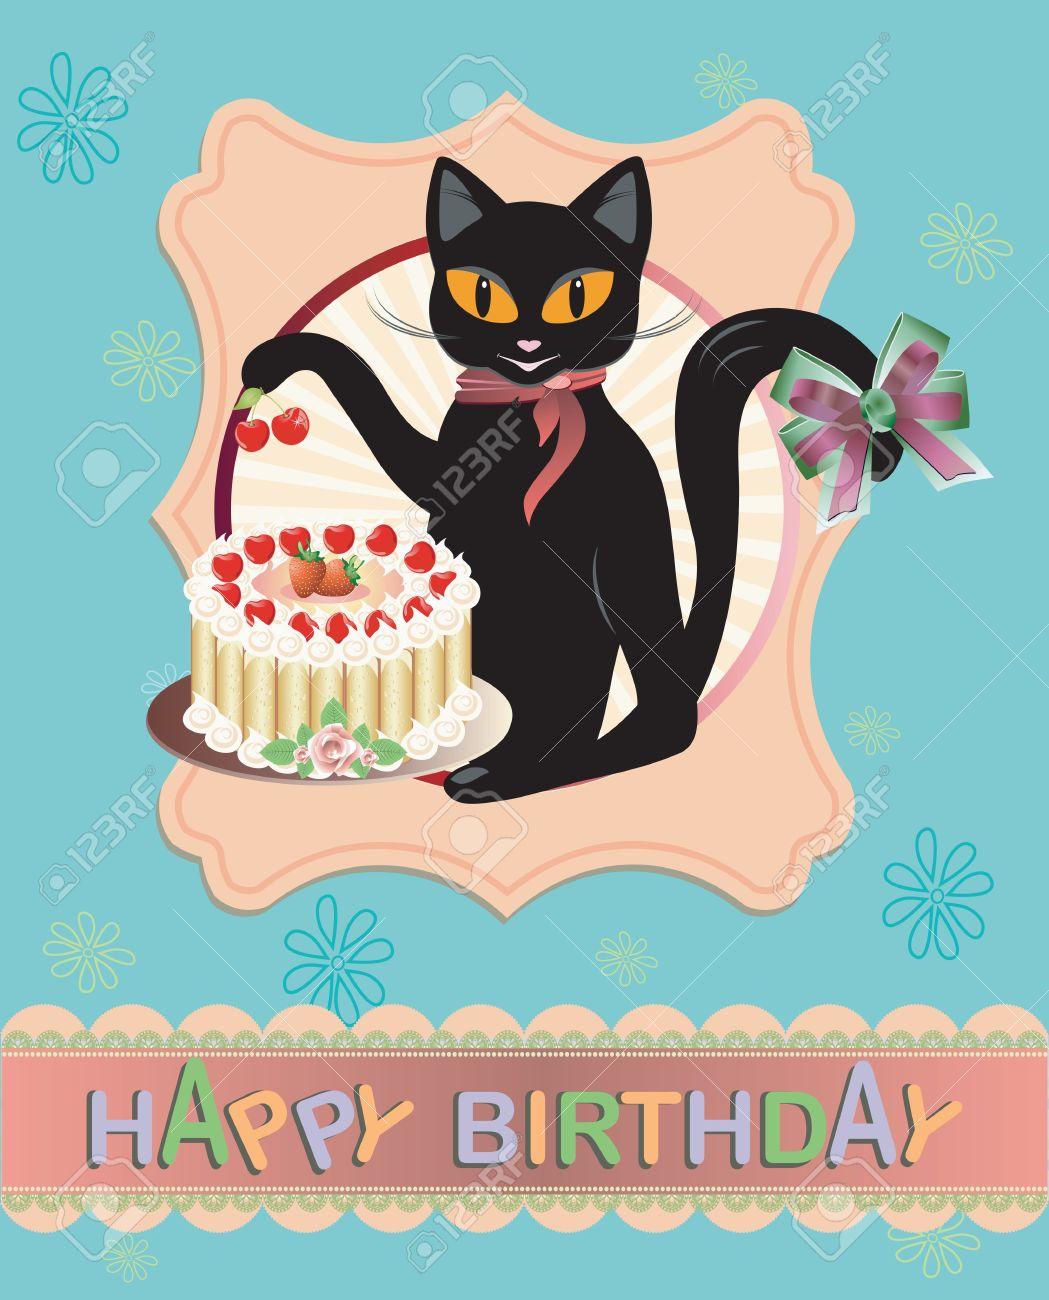 Funny vector cat birthday greeting card royalty free cliparts funny vector cat birthday greeting card stock vector 21732035 kristyandbryce Gallery